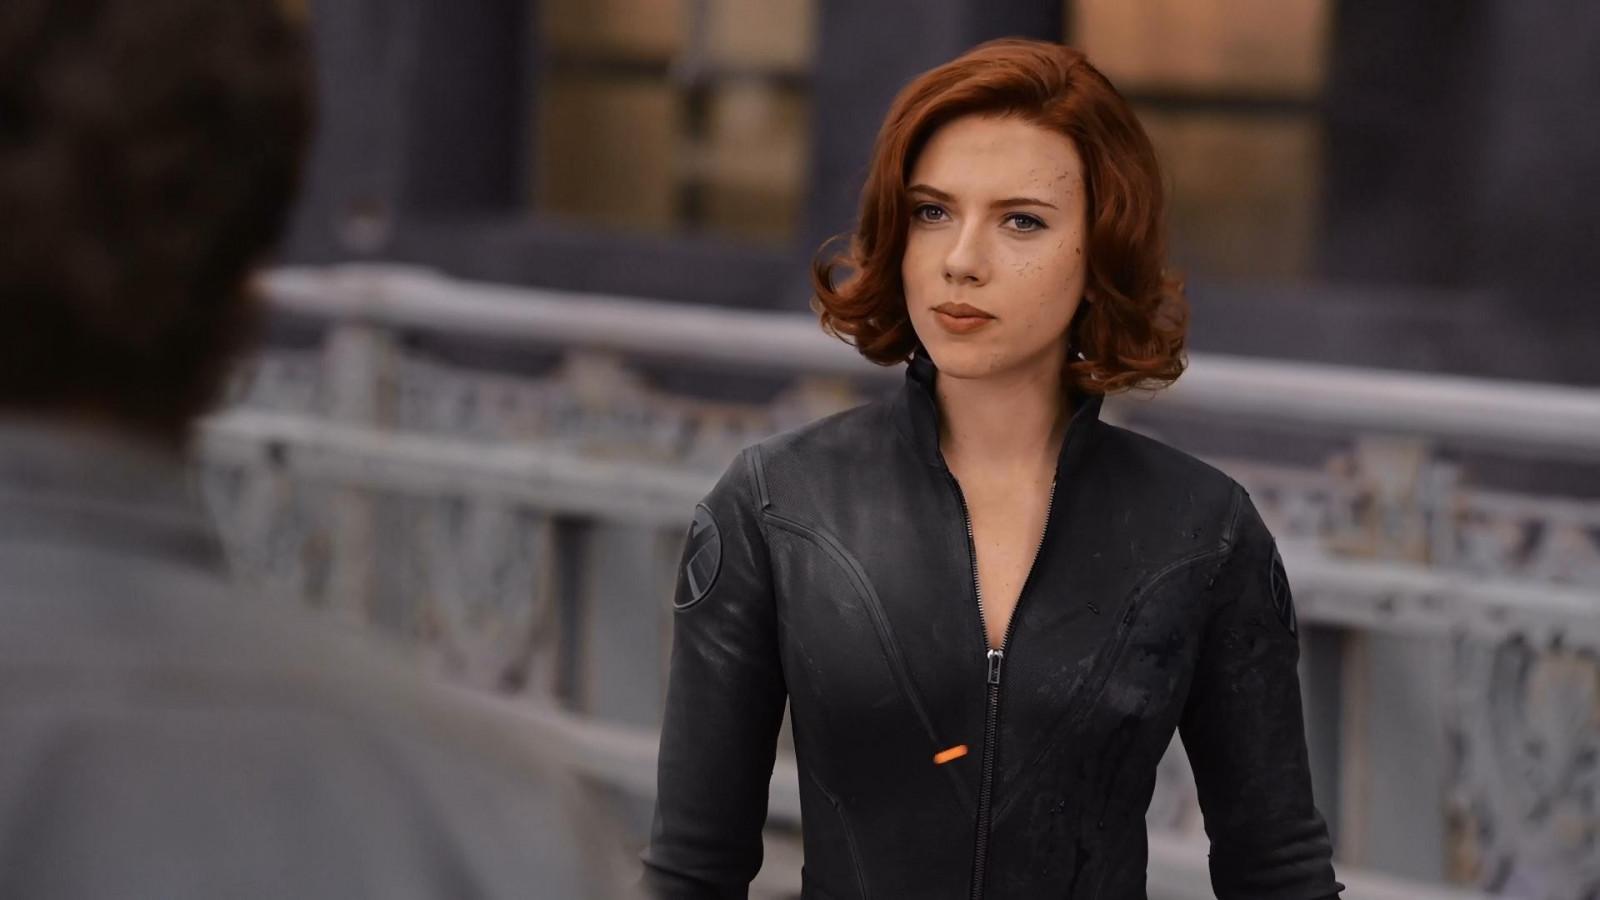 Wallpaper : model, movies, jacket, fashion, The Avengers ...